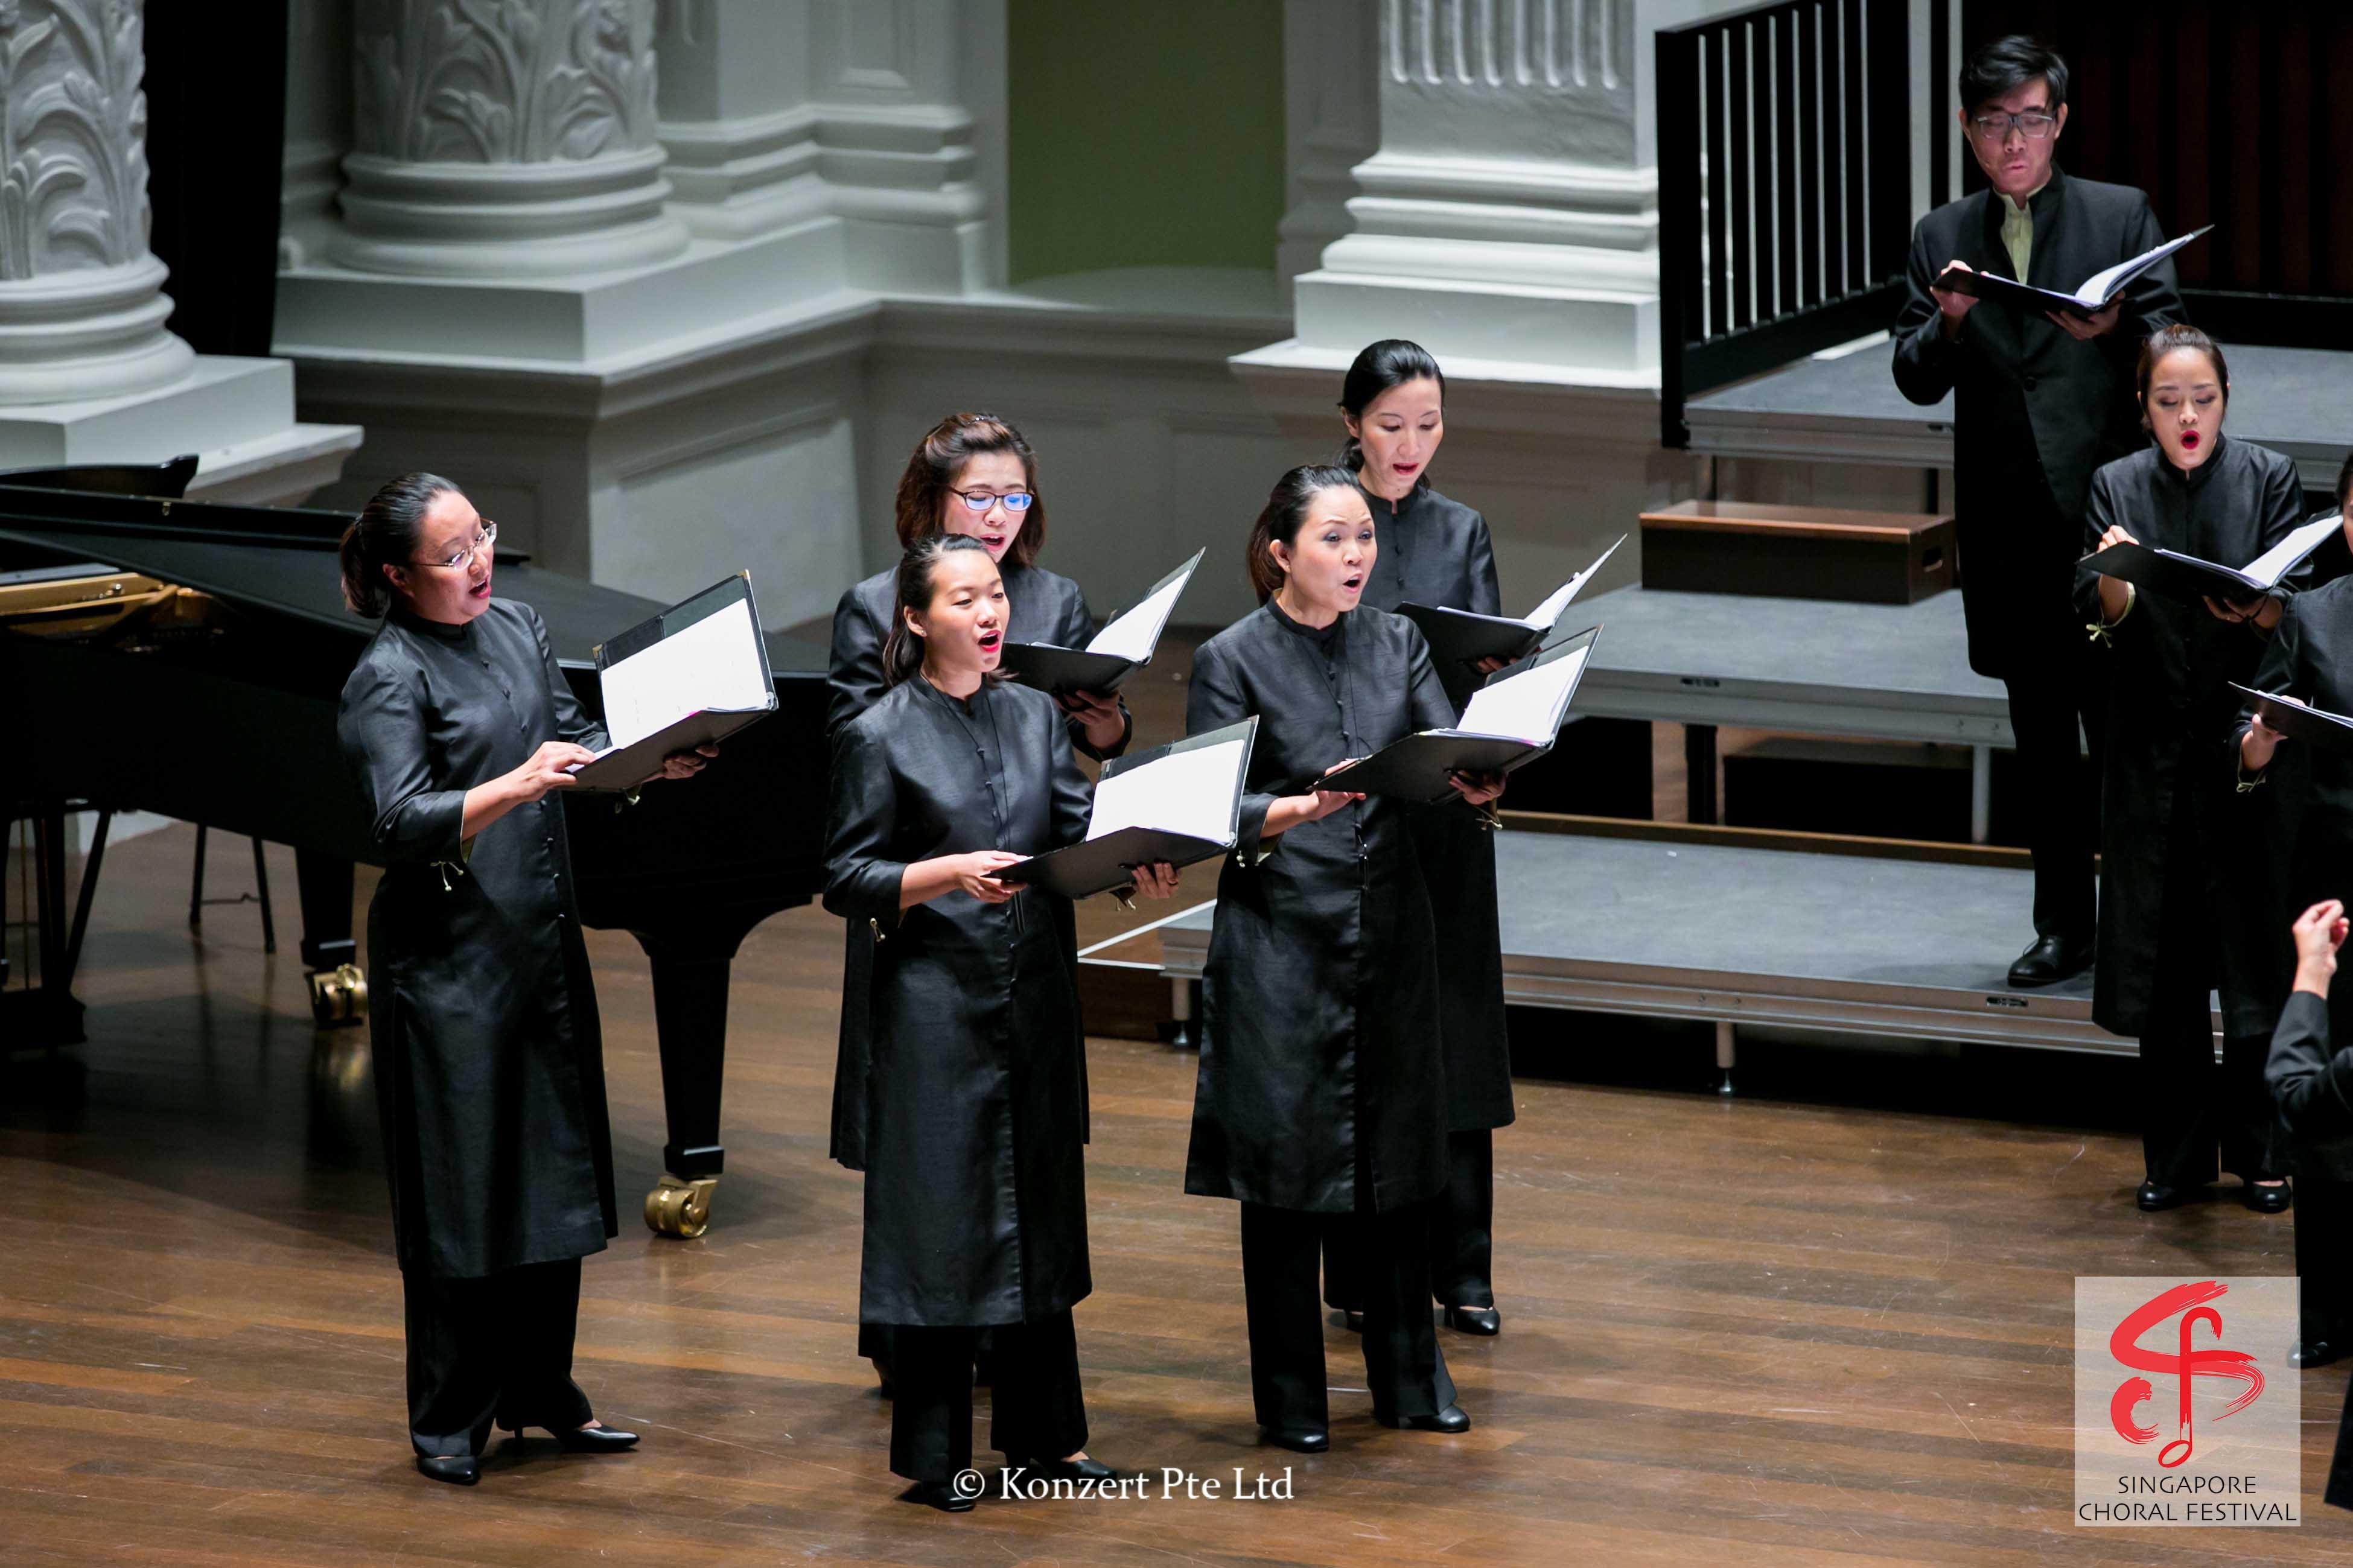 Singapore Choral Festival 8-8-15 (223).jpg